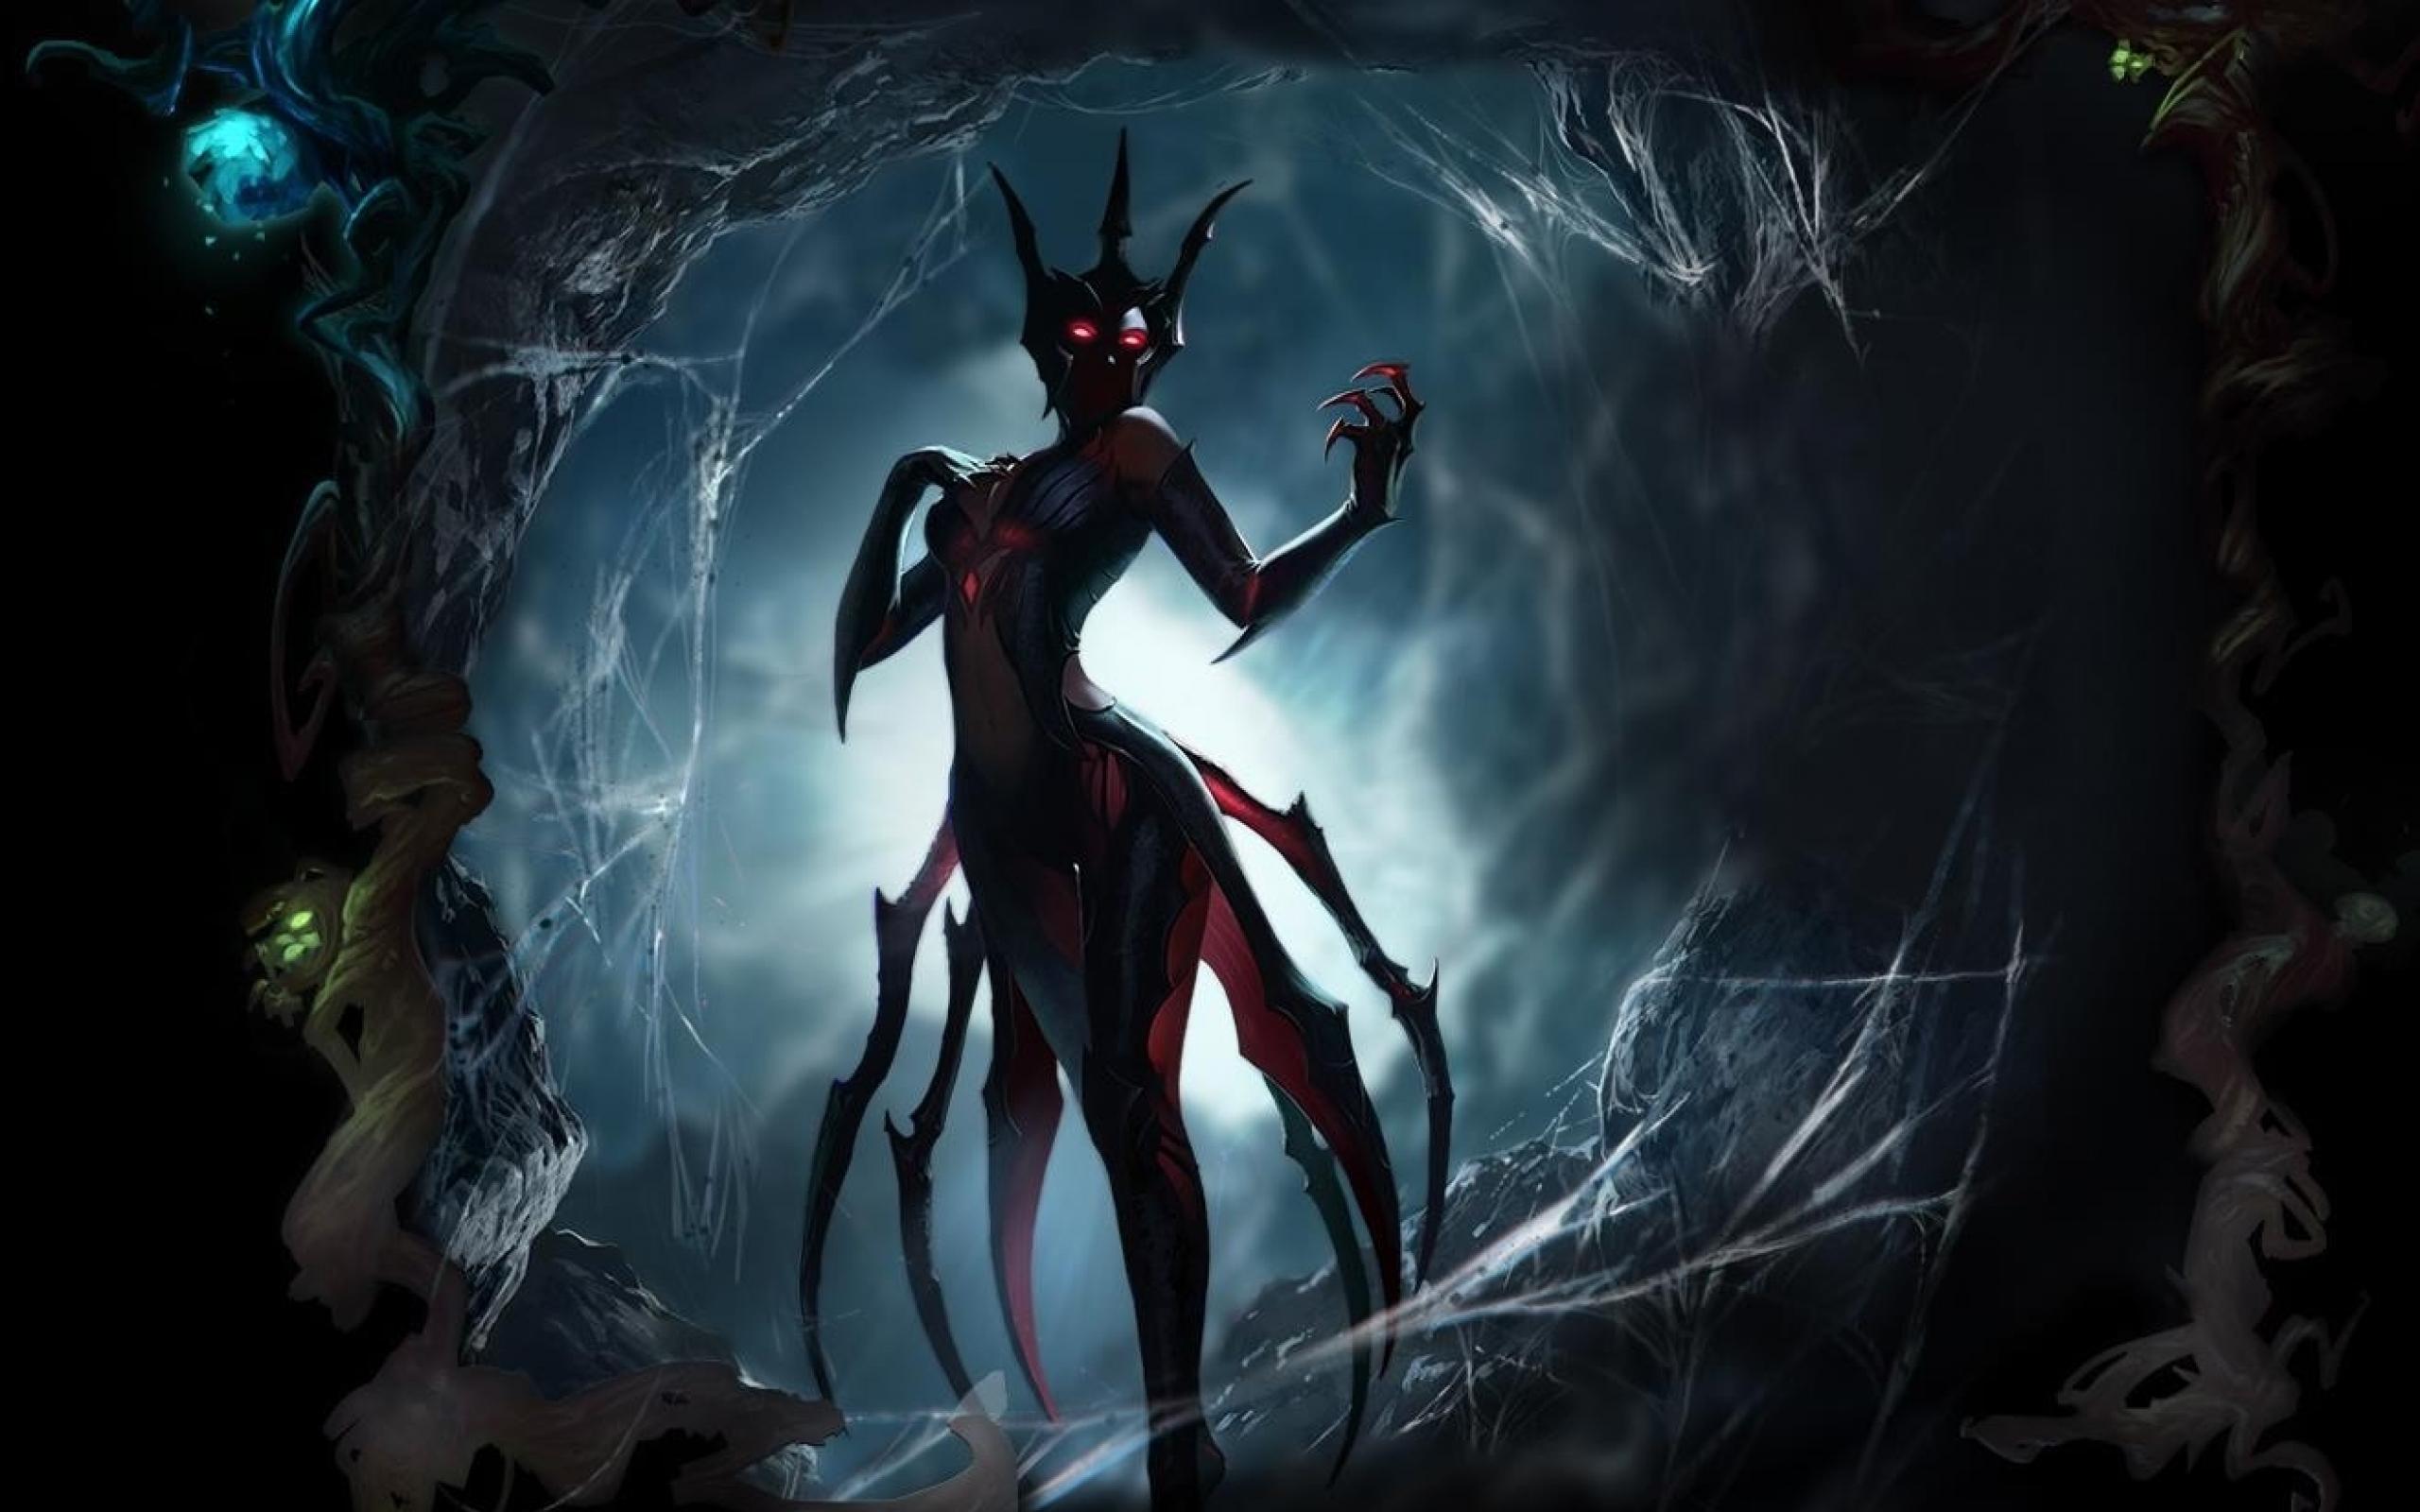 of legends elise the spider queen 1317x890 wallpaper Art HD Wallpaper 2560x1600